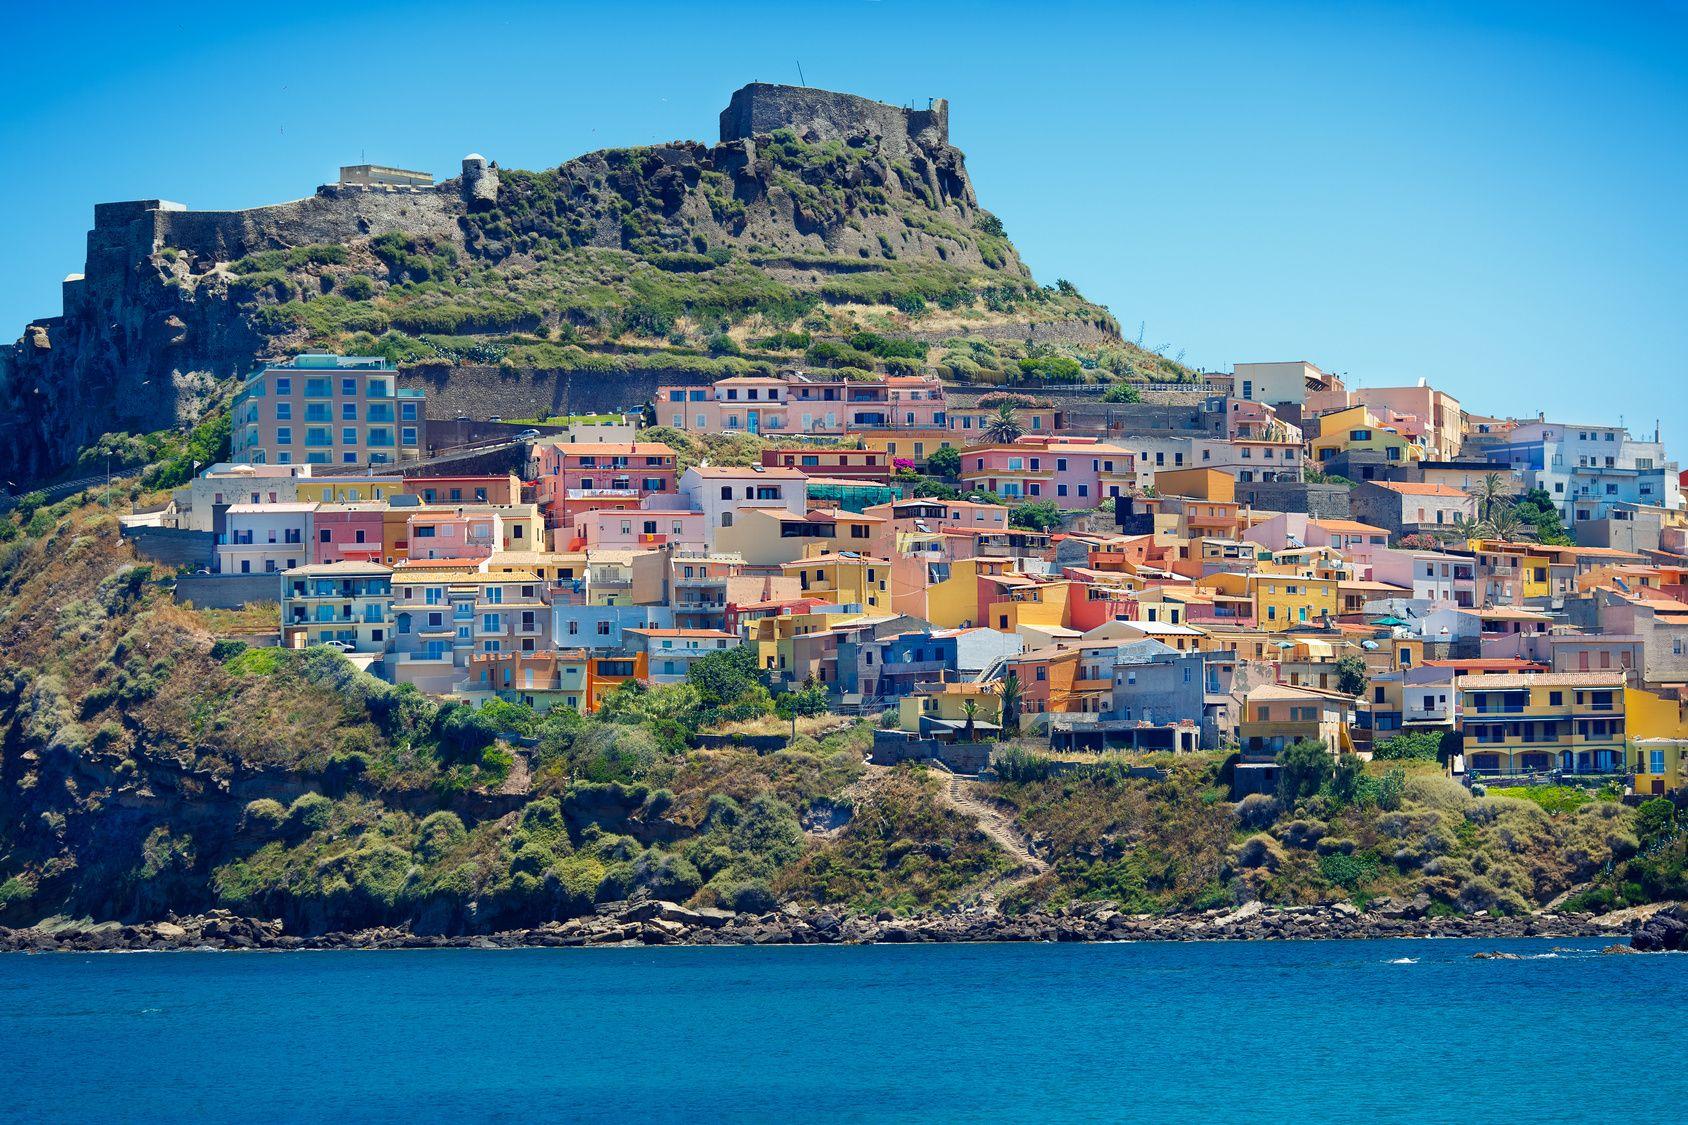 Beautiful medieval town Castelsardo on the north coast of Sardinia island, Italy